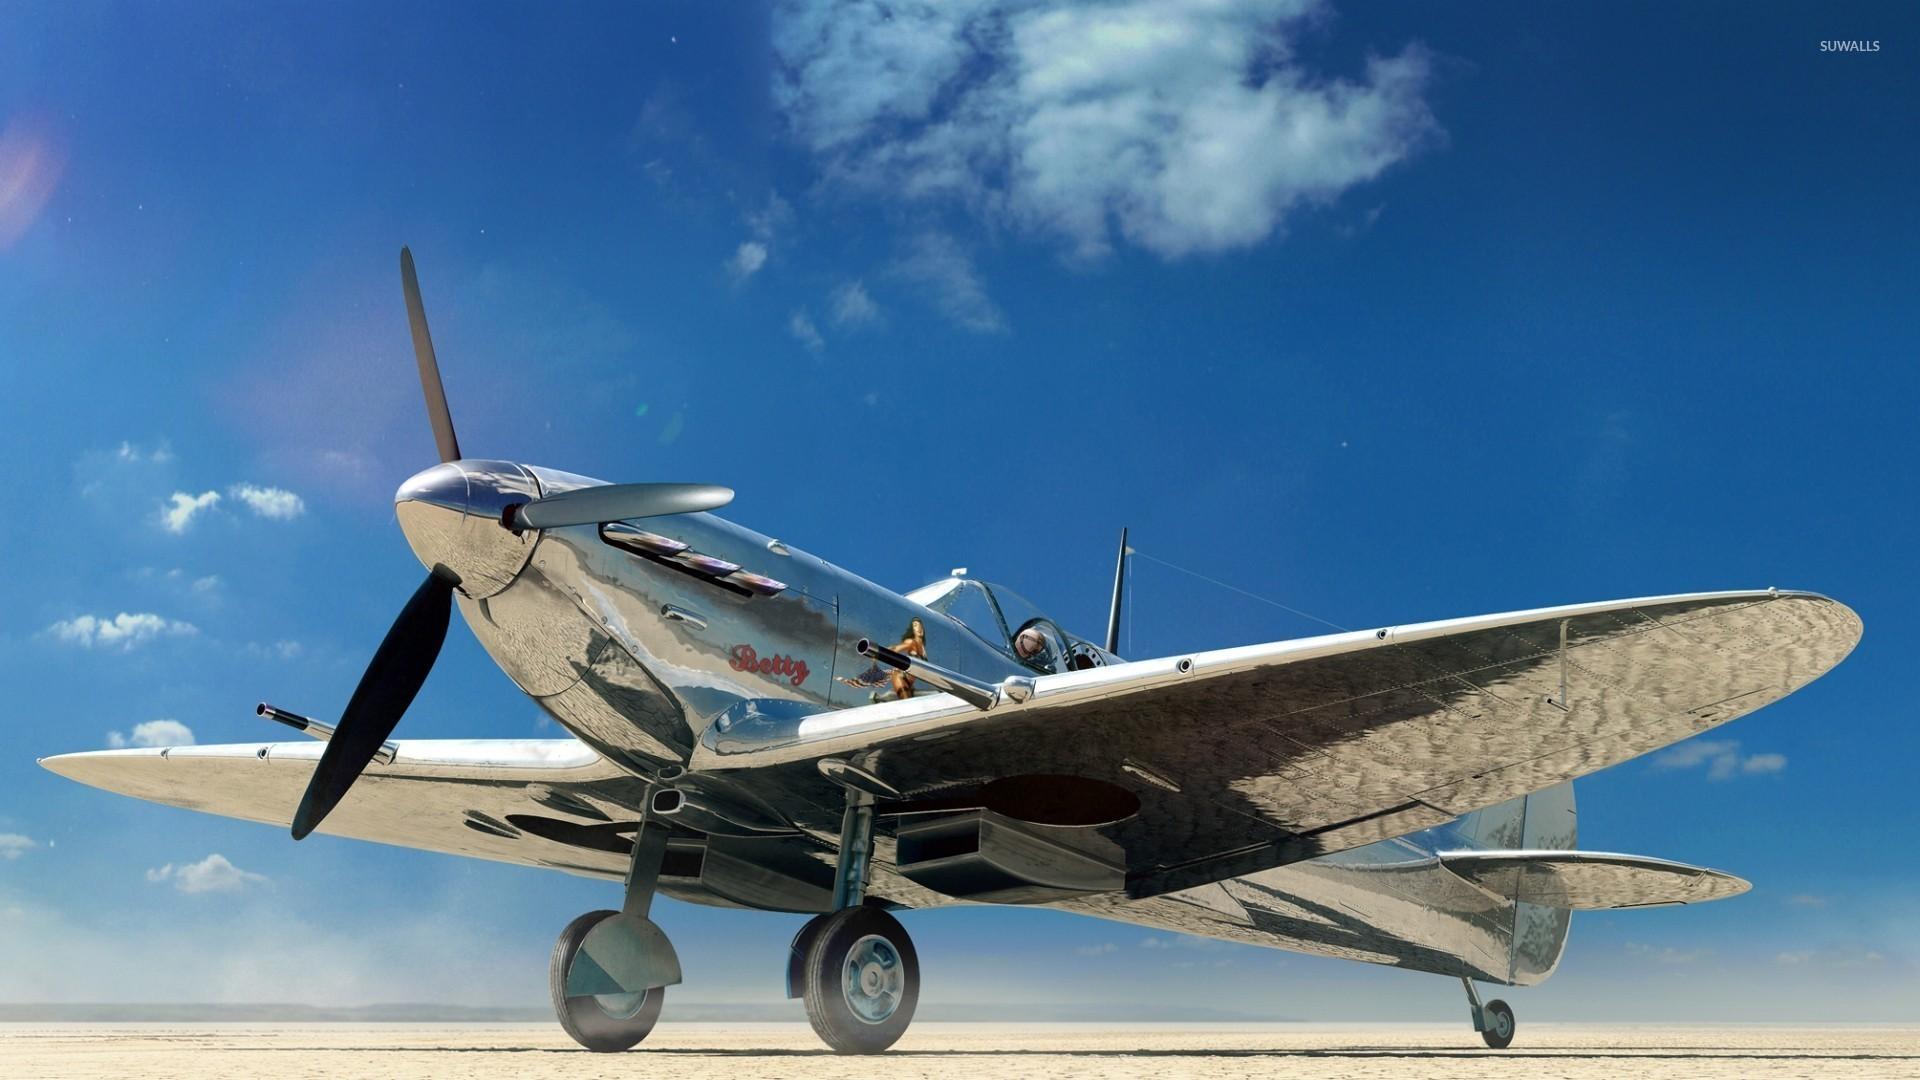 Res: 1920x1080, Supermarine Spitfire [6] wallpaper